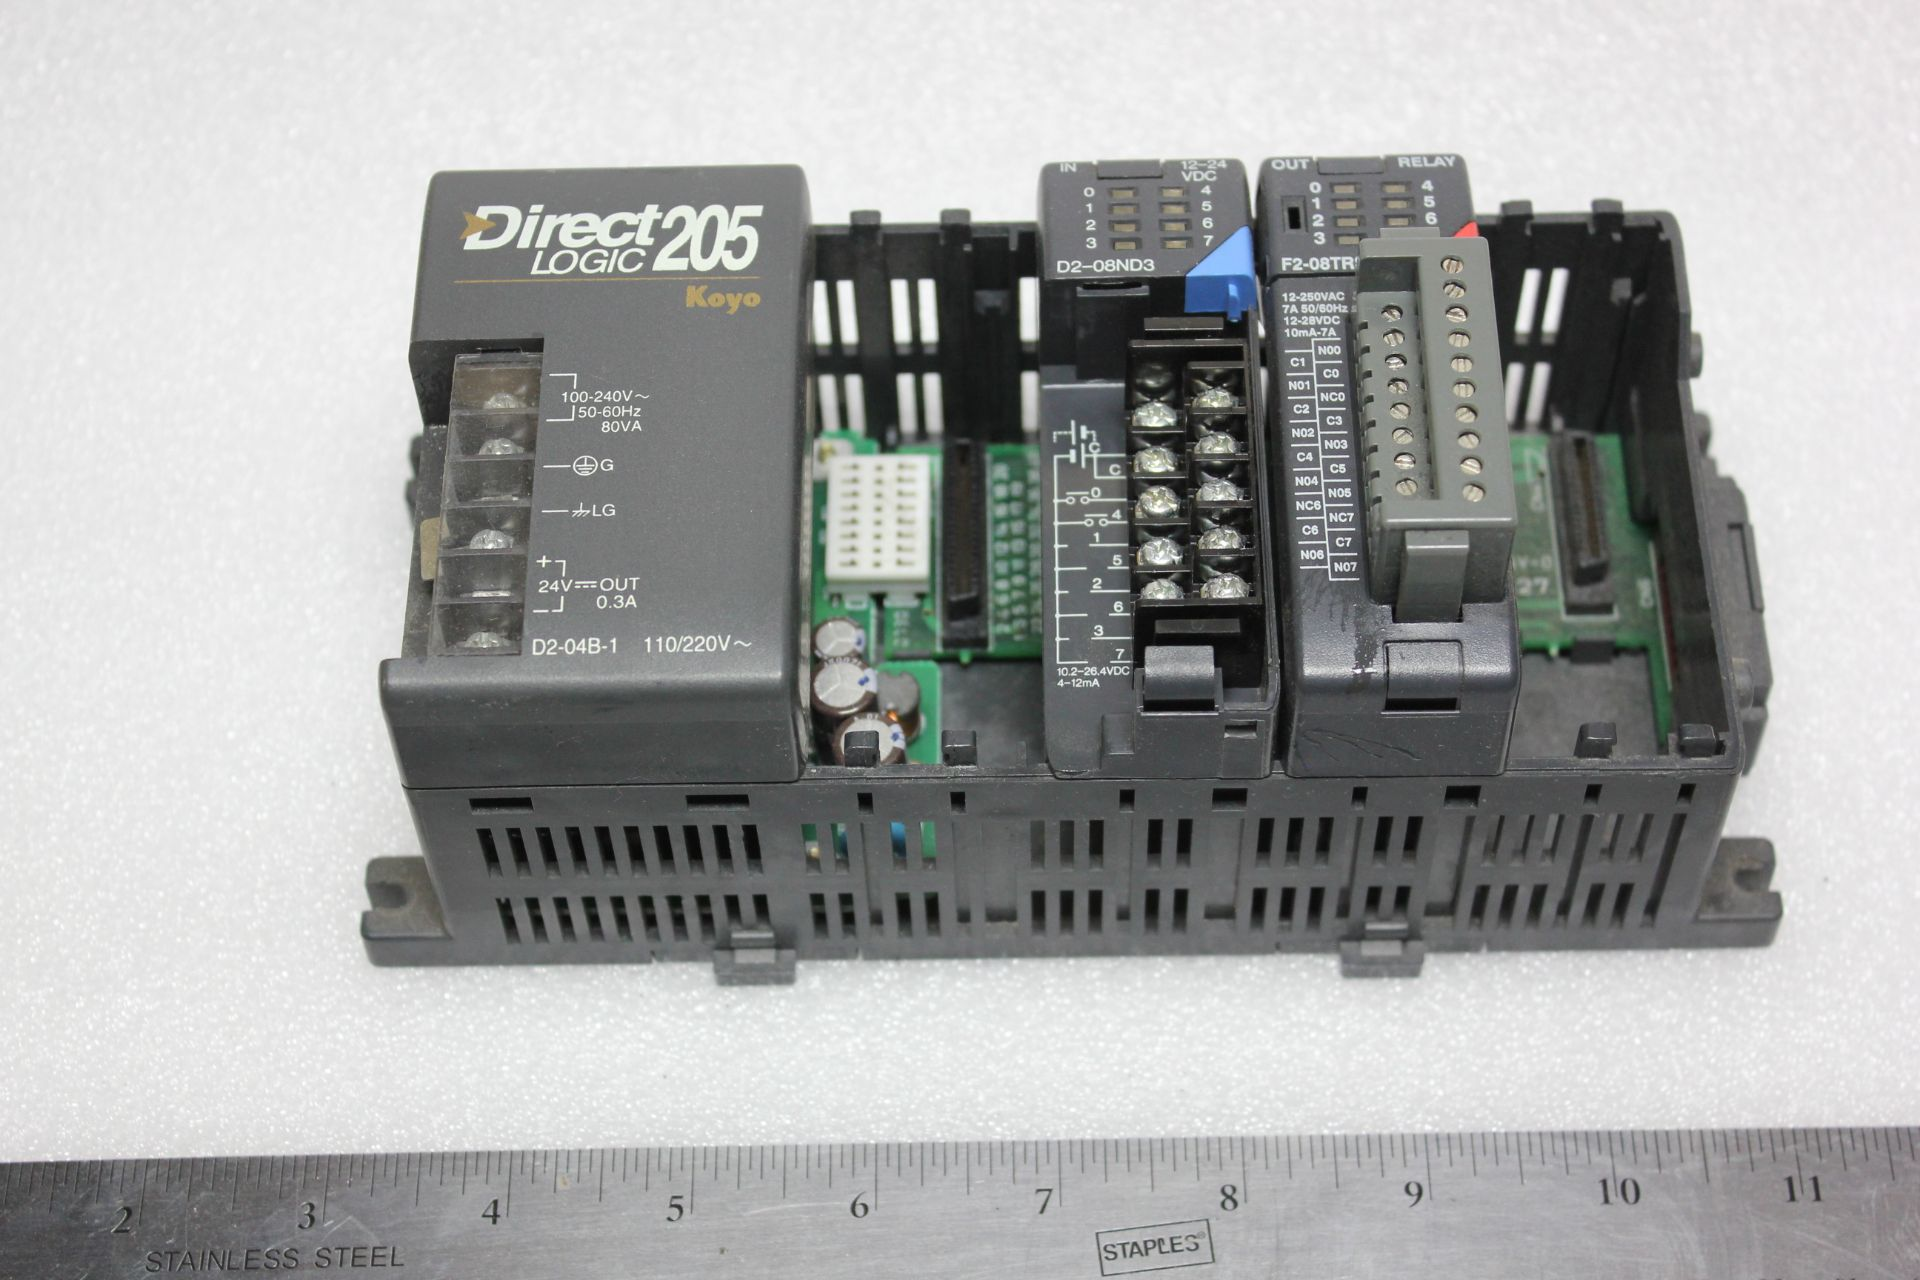 Lot 10 - KOYO DIRECT LOGIC 205 PLC CHASSIS WITH MODULES